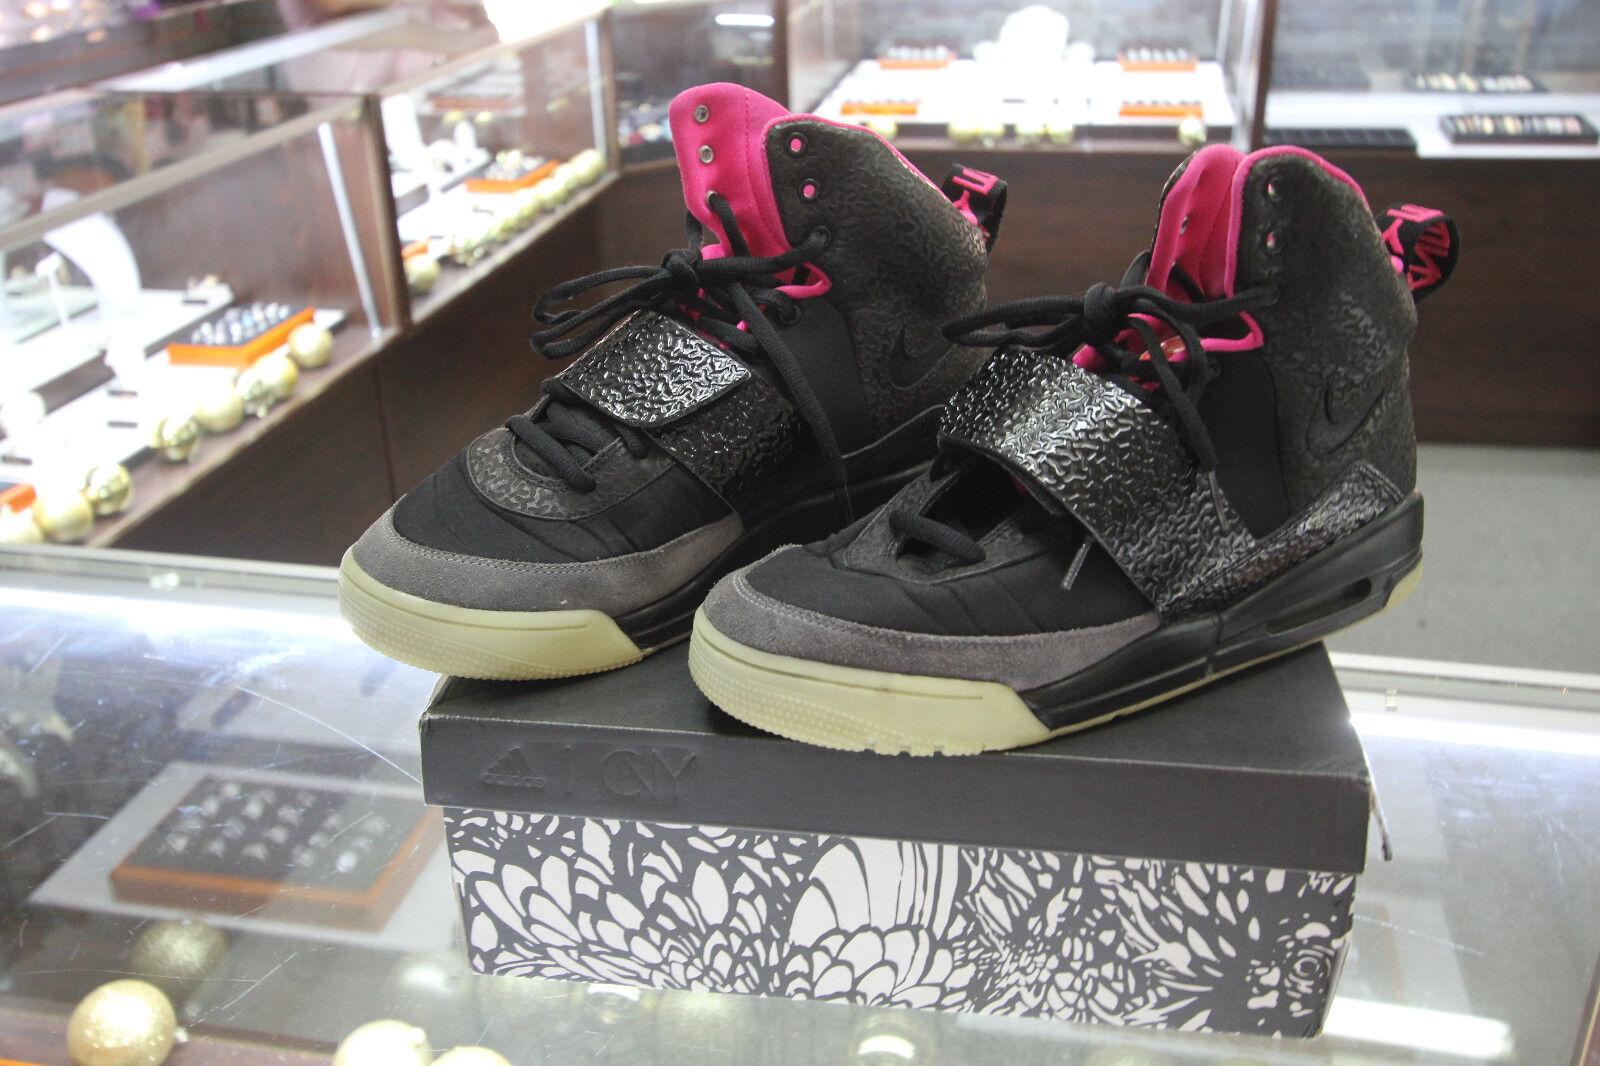 Nike Air Yeezy 1 Blink Black Pink Size 11 366164-003 2009